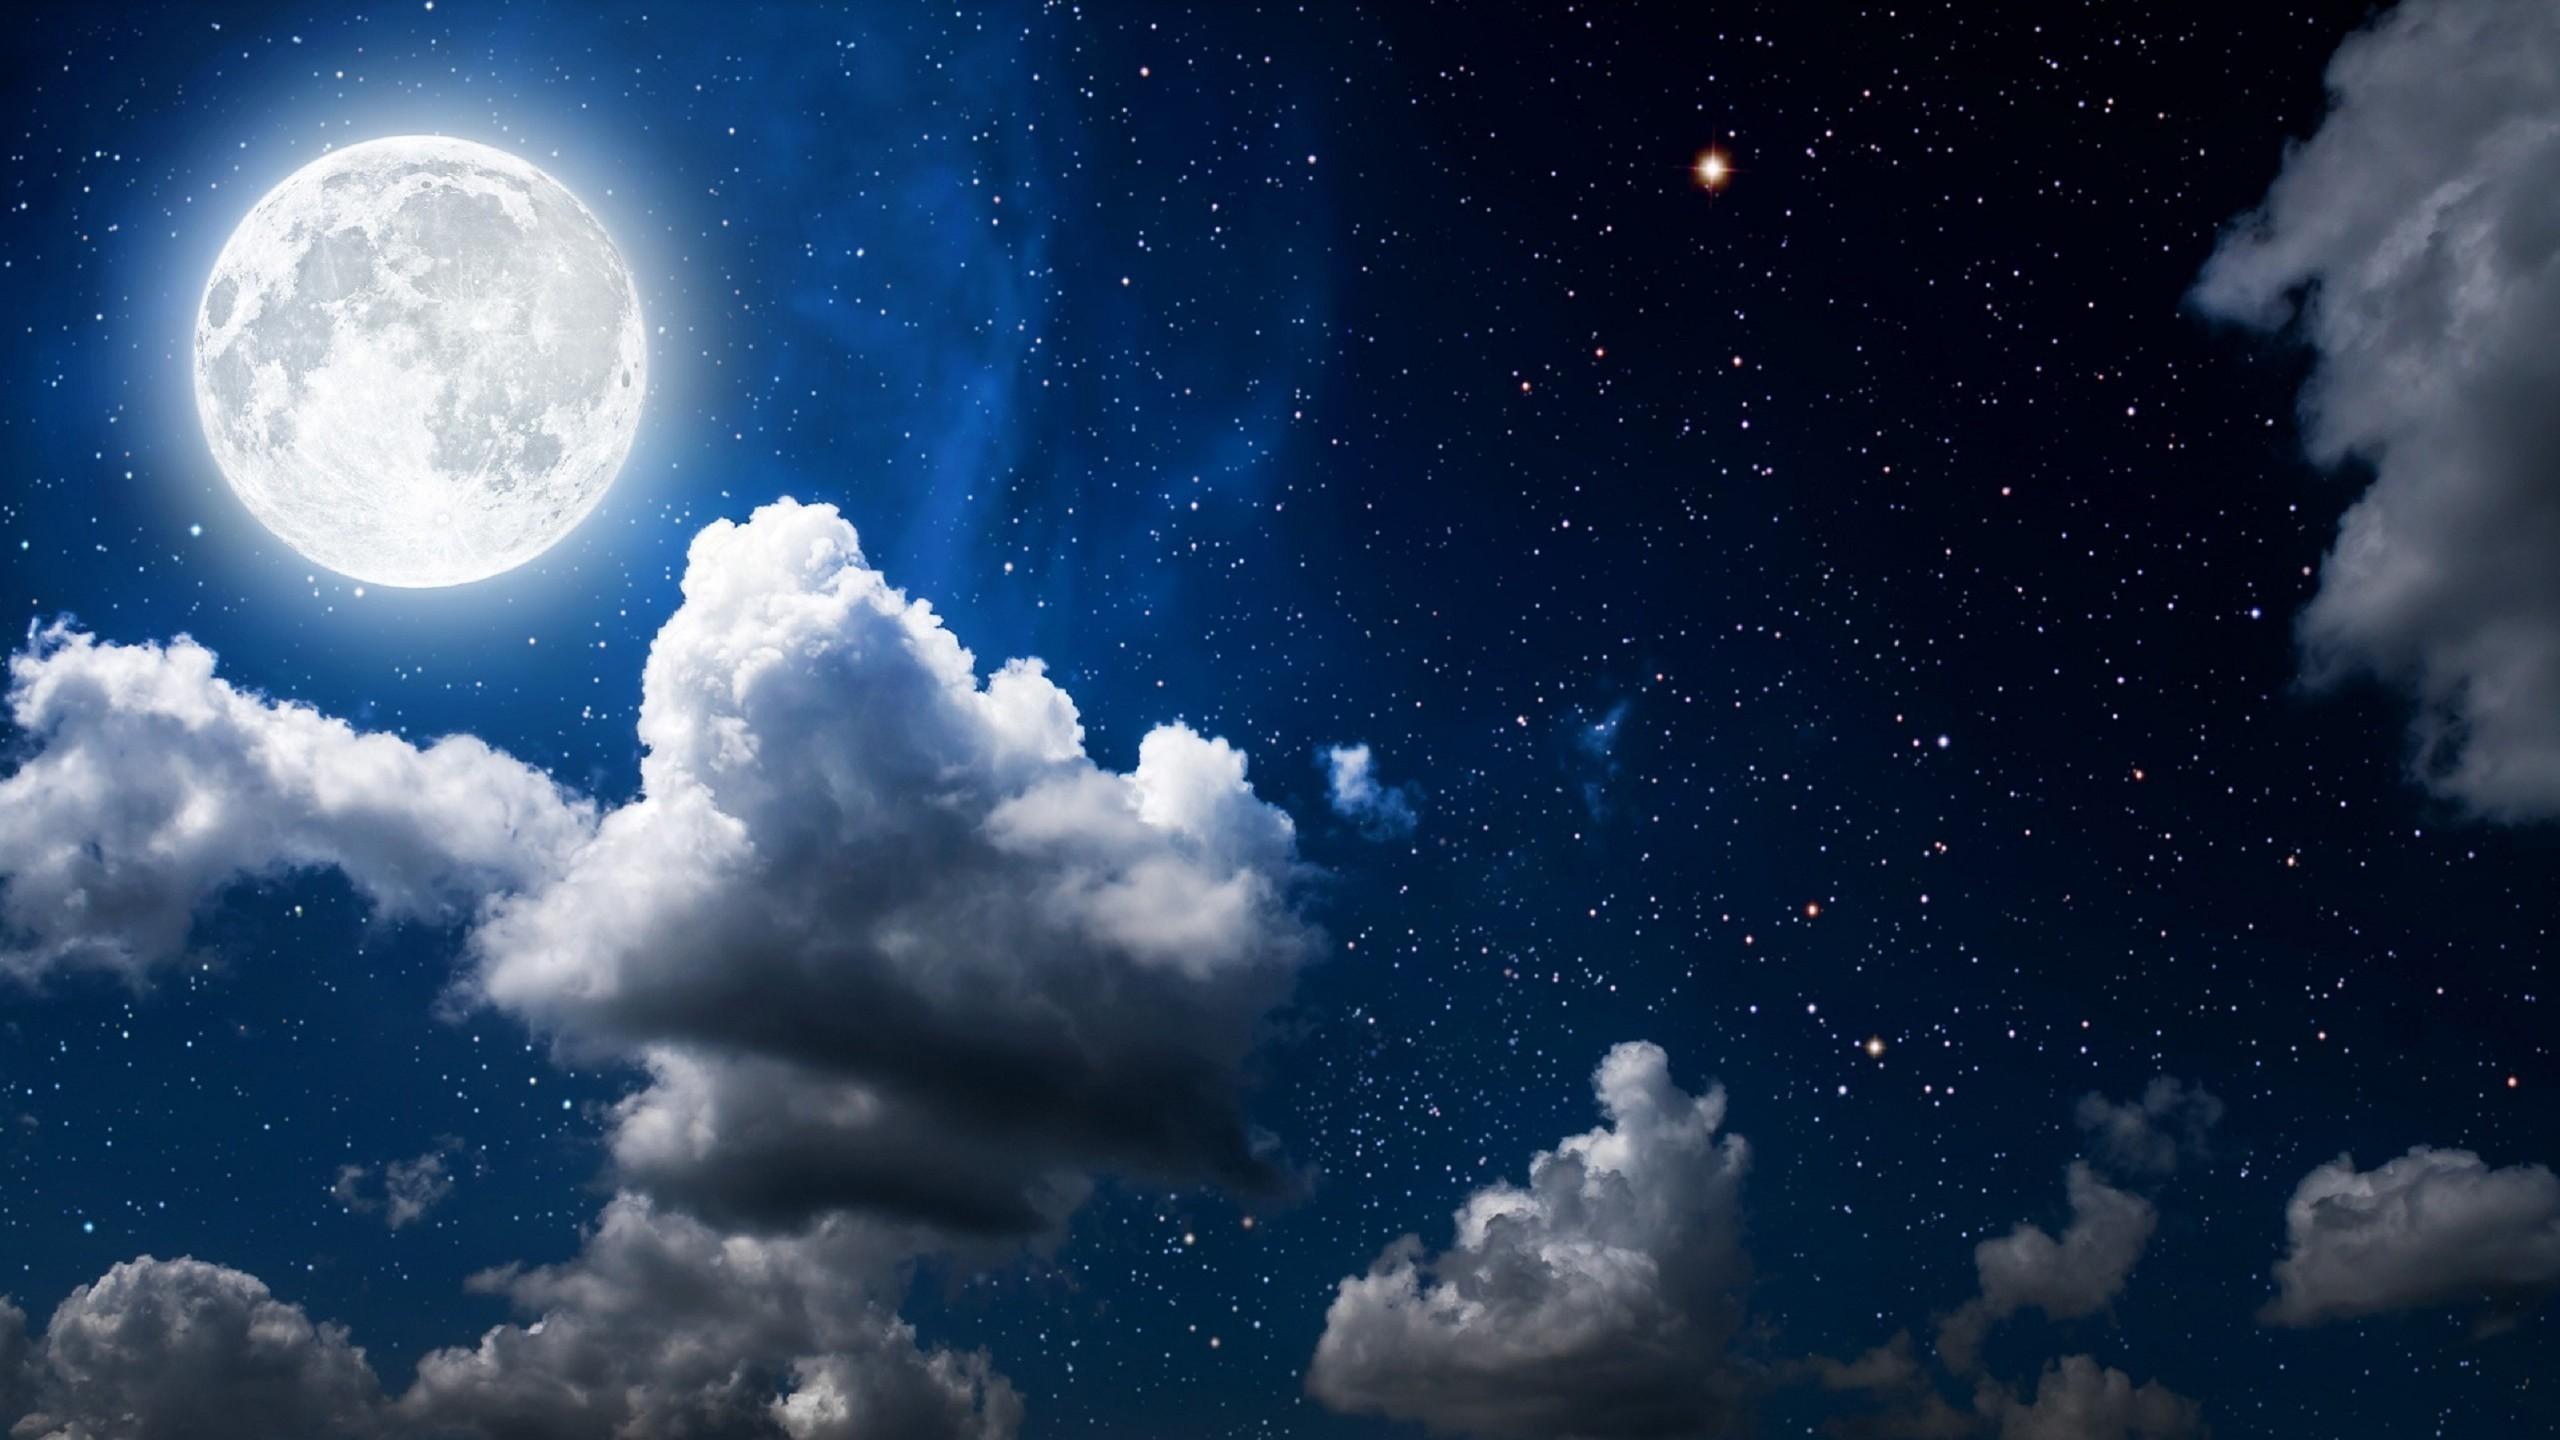 Moon Wallpaper Iphone Moon Clouds Dark Sky Wallpapers Hd Wallpapers Id 18374